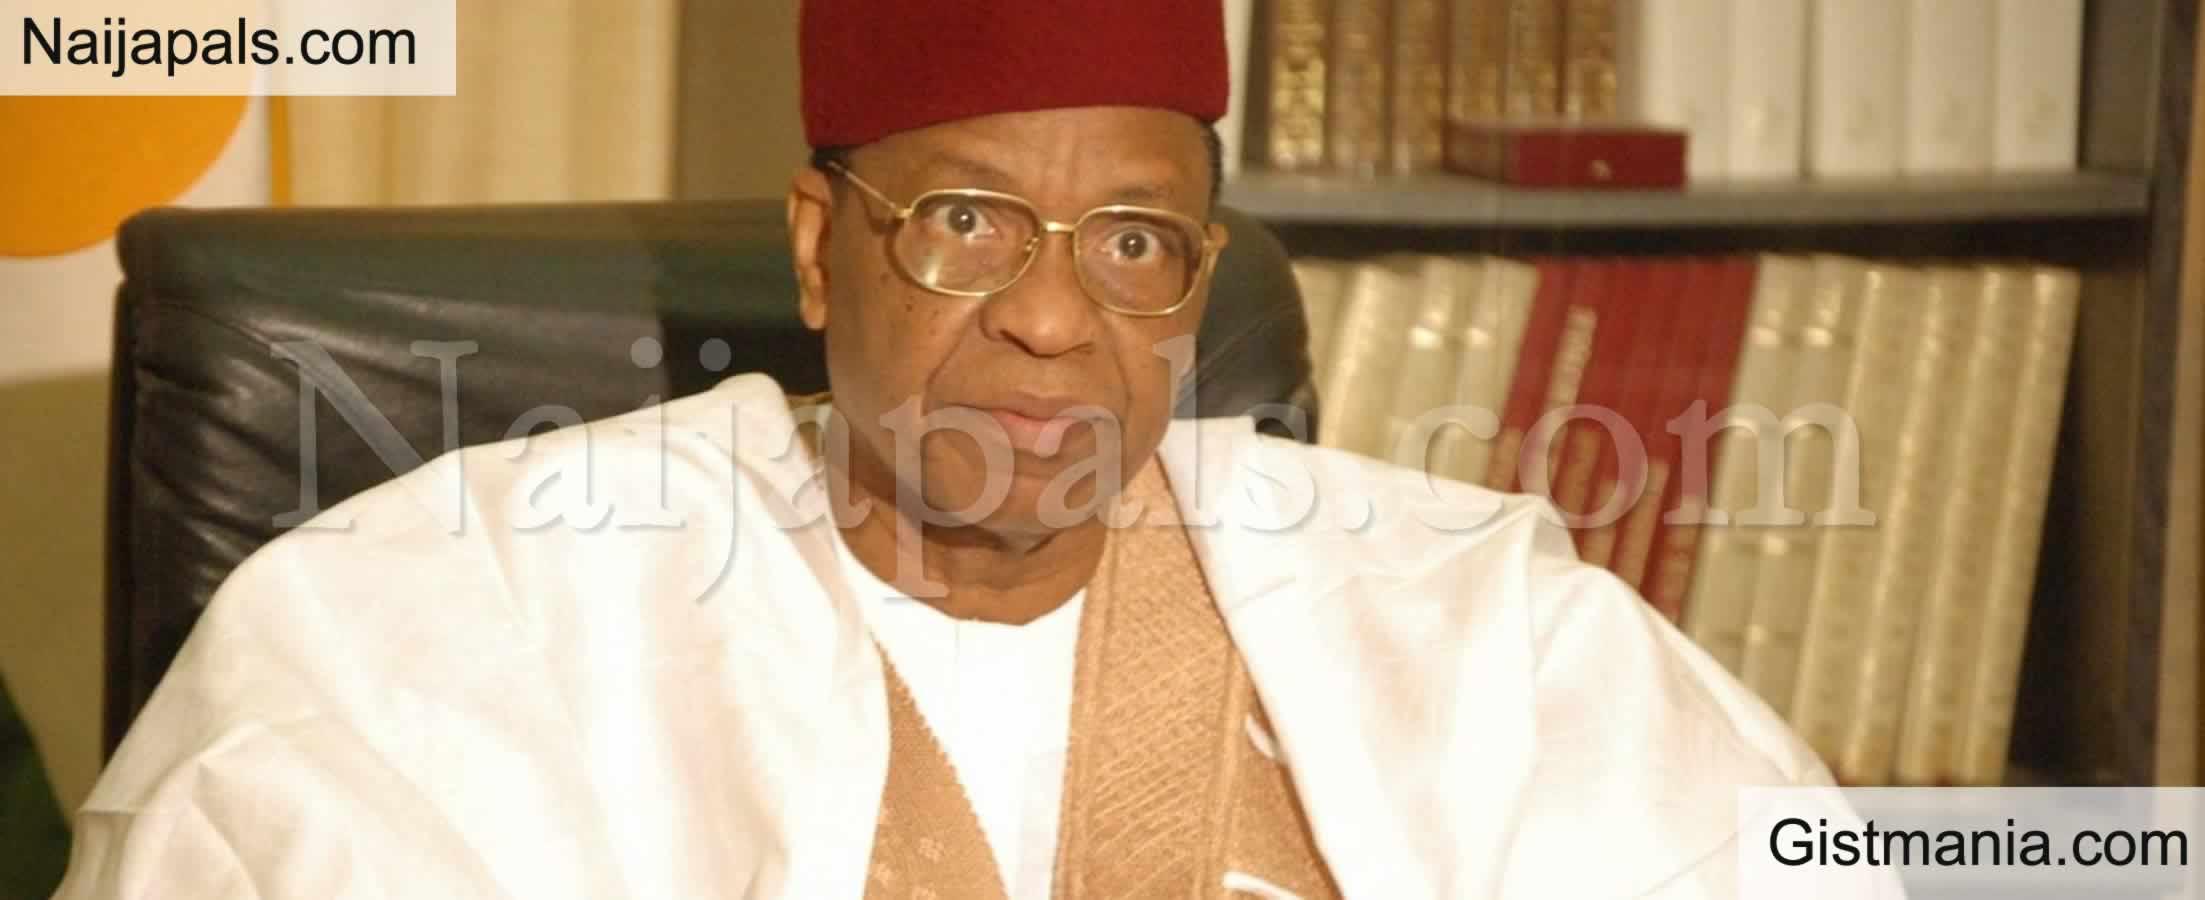 <img alt='.' class='lazyload' data-src='https://img.gistmania.com/emot/news.gif' /> <b>Former Niger President, Mamadou Tandja Dies At Age 82</b>